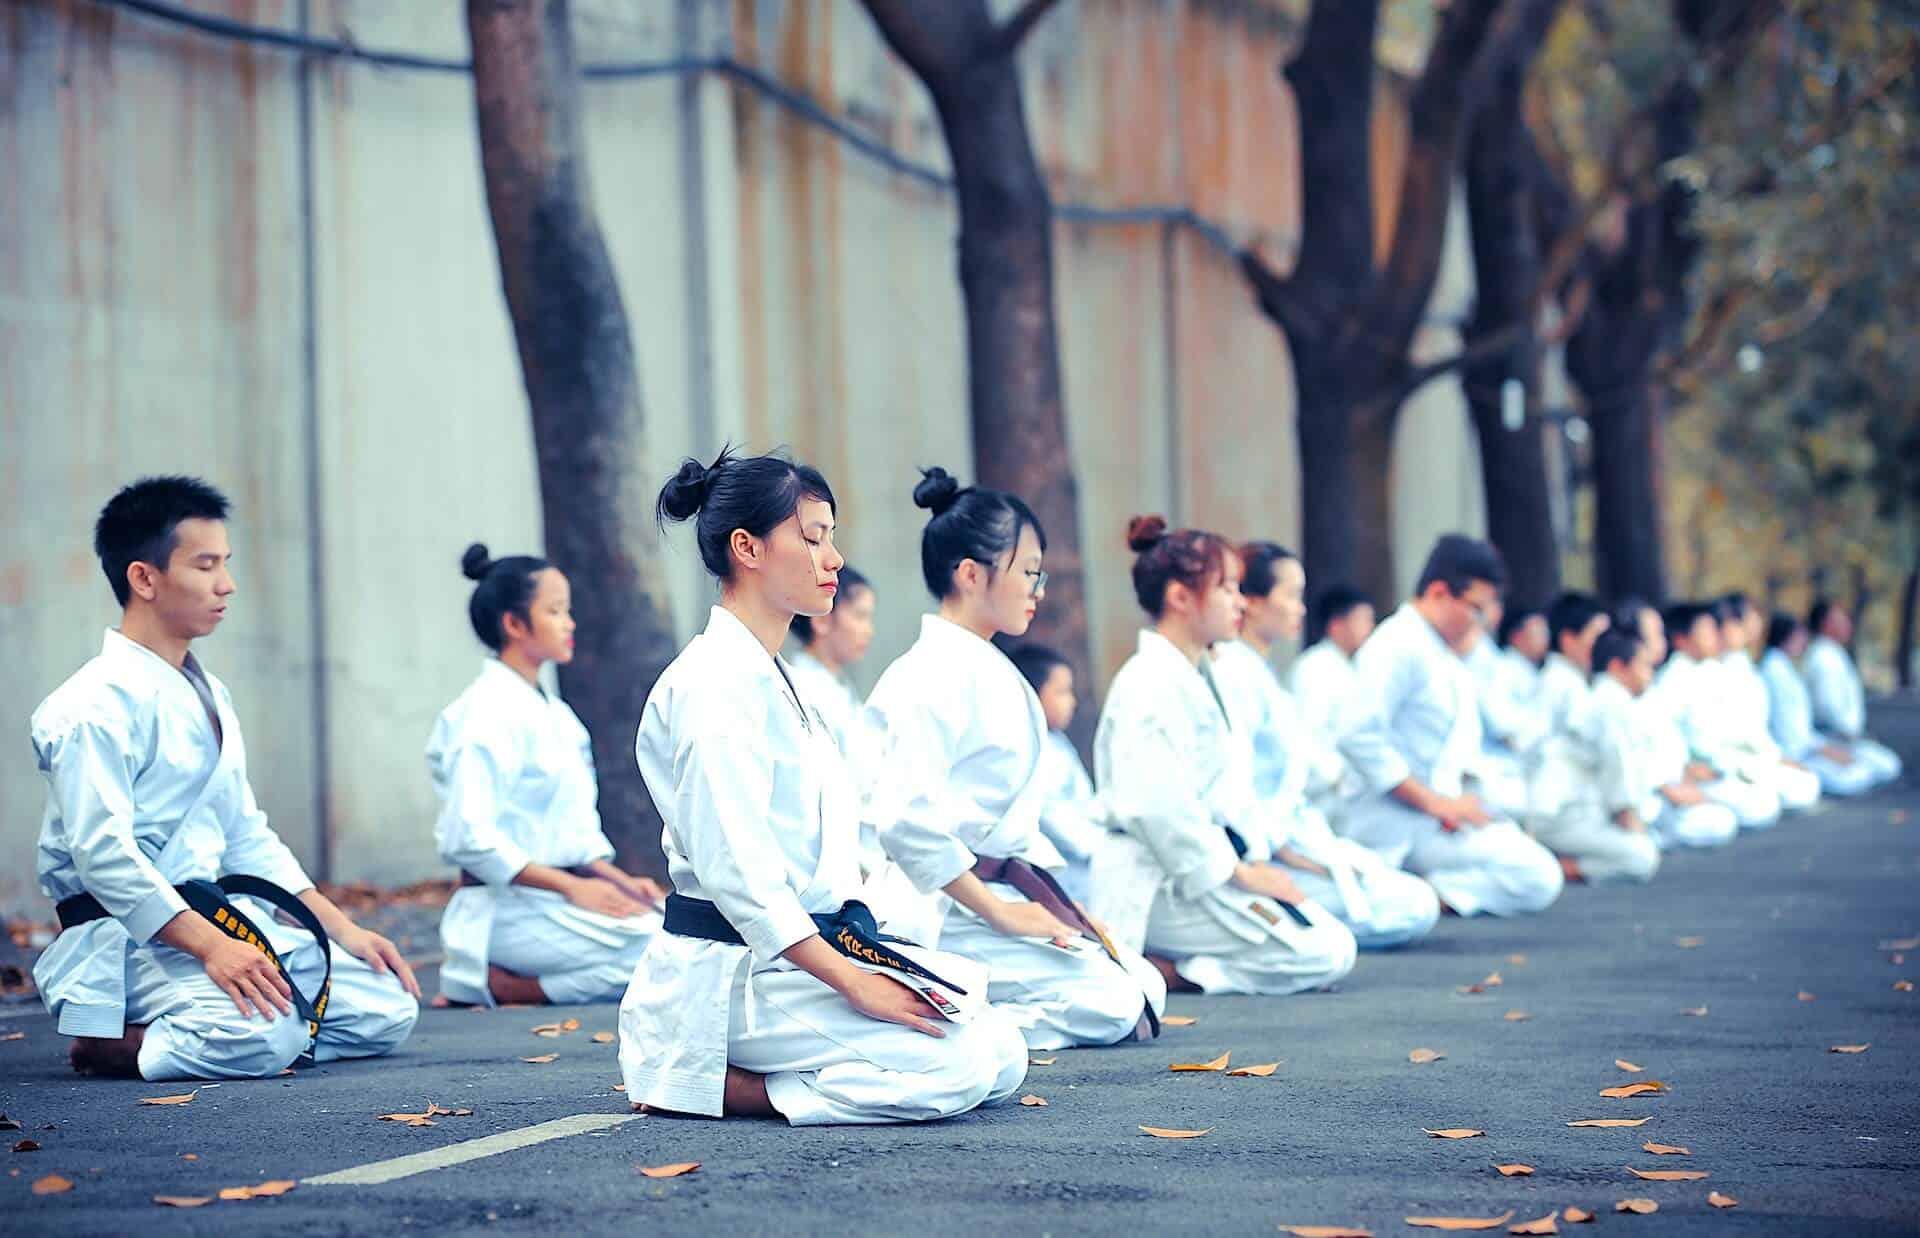 Scopri il Karate Jitsu Adulti - Karate Jitsu